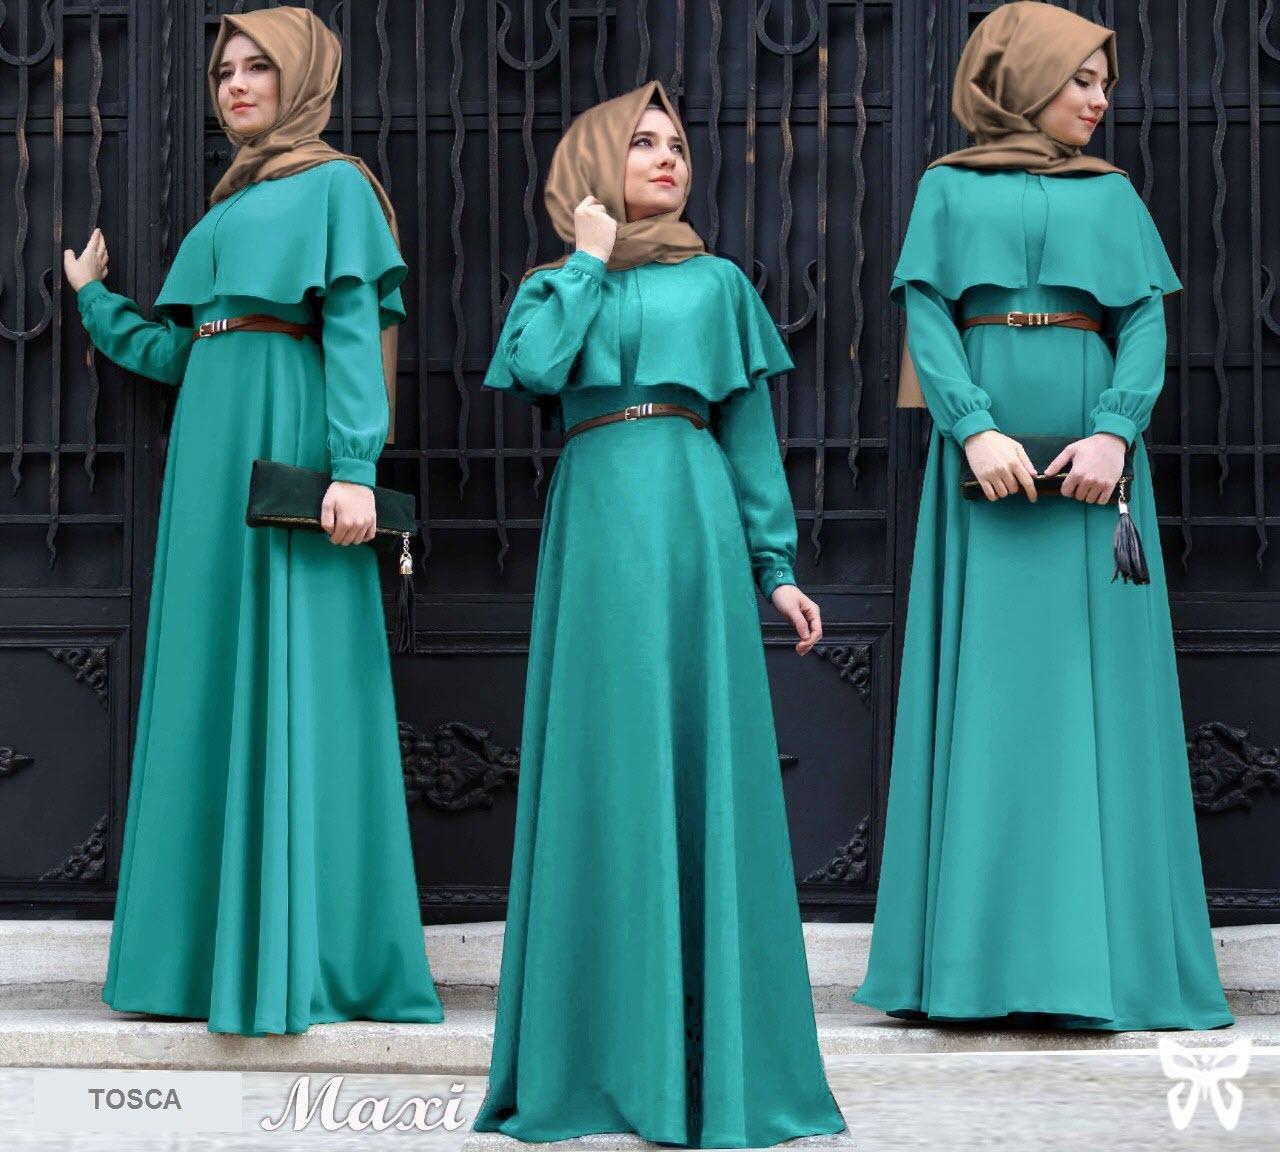 Flavia Store Maxi Dress Lengan Panjang Set 3 in 1 FS0623 - TOSCA / Gamis Syari / Gaun Pesta Muslimah / Baju Muslim Wanita Syar'i / Hijab Jilbab Pashmina / Srclara